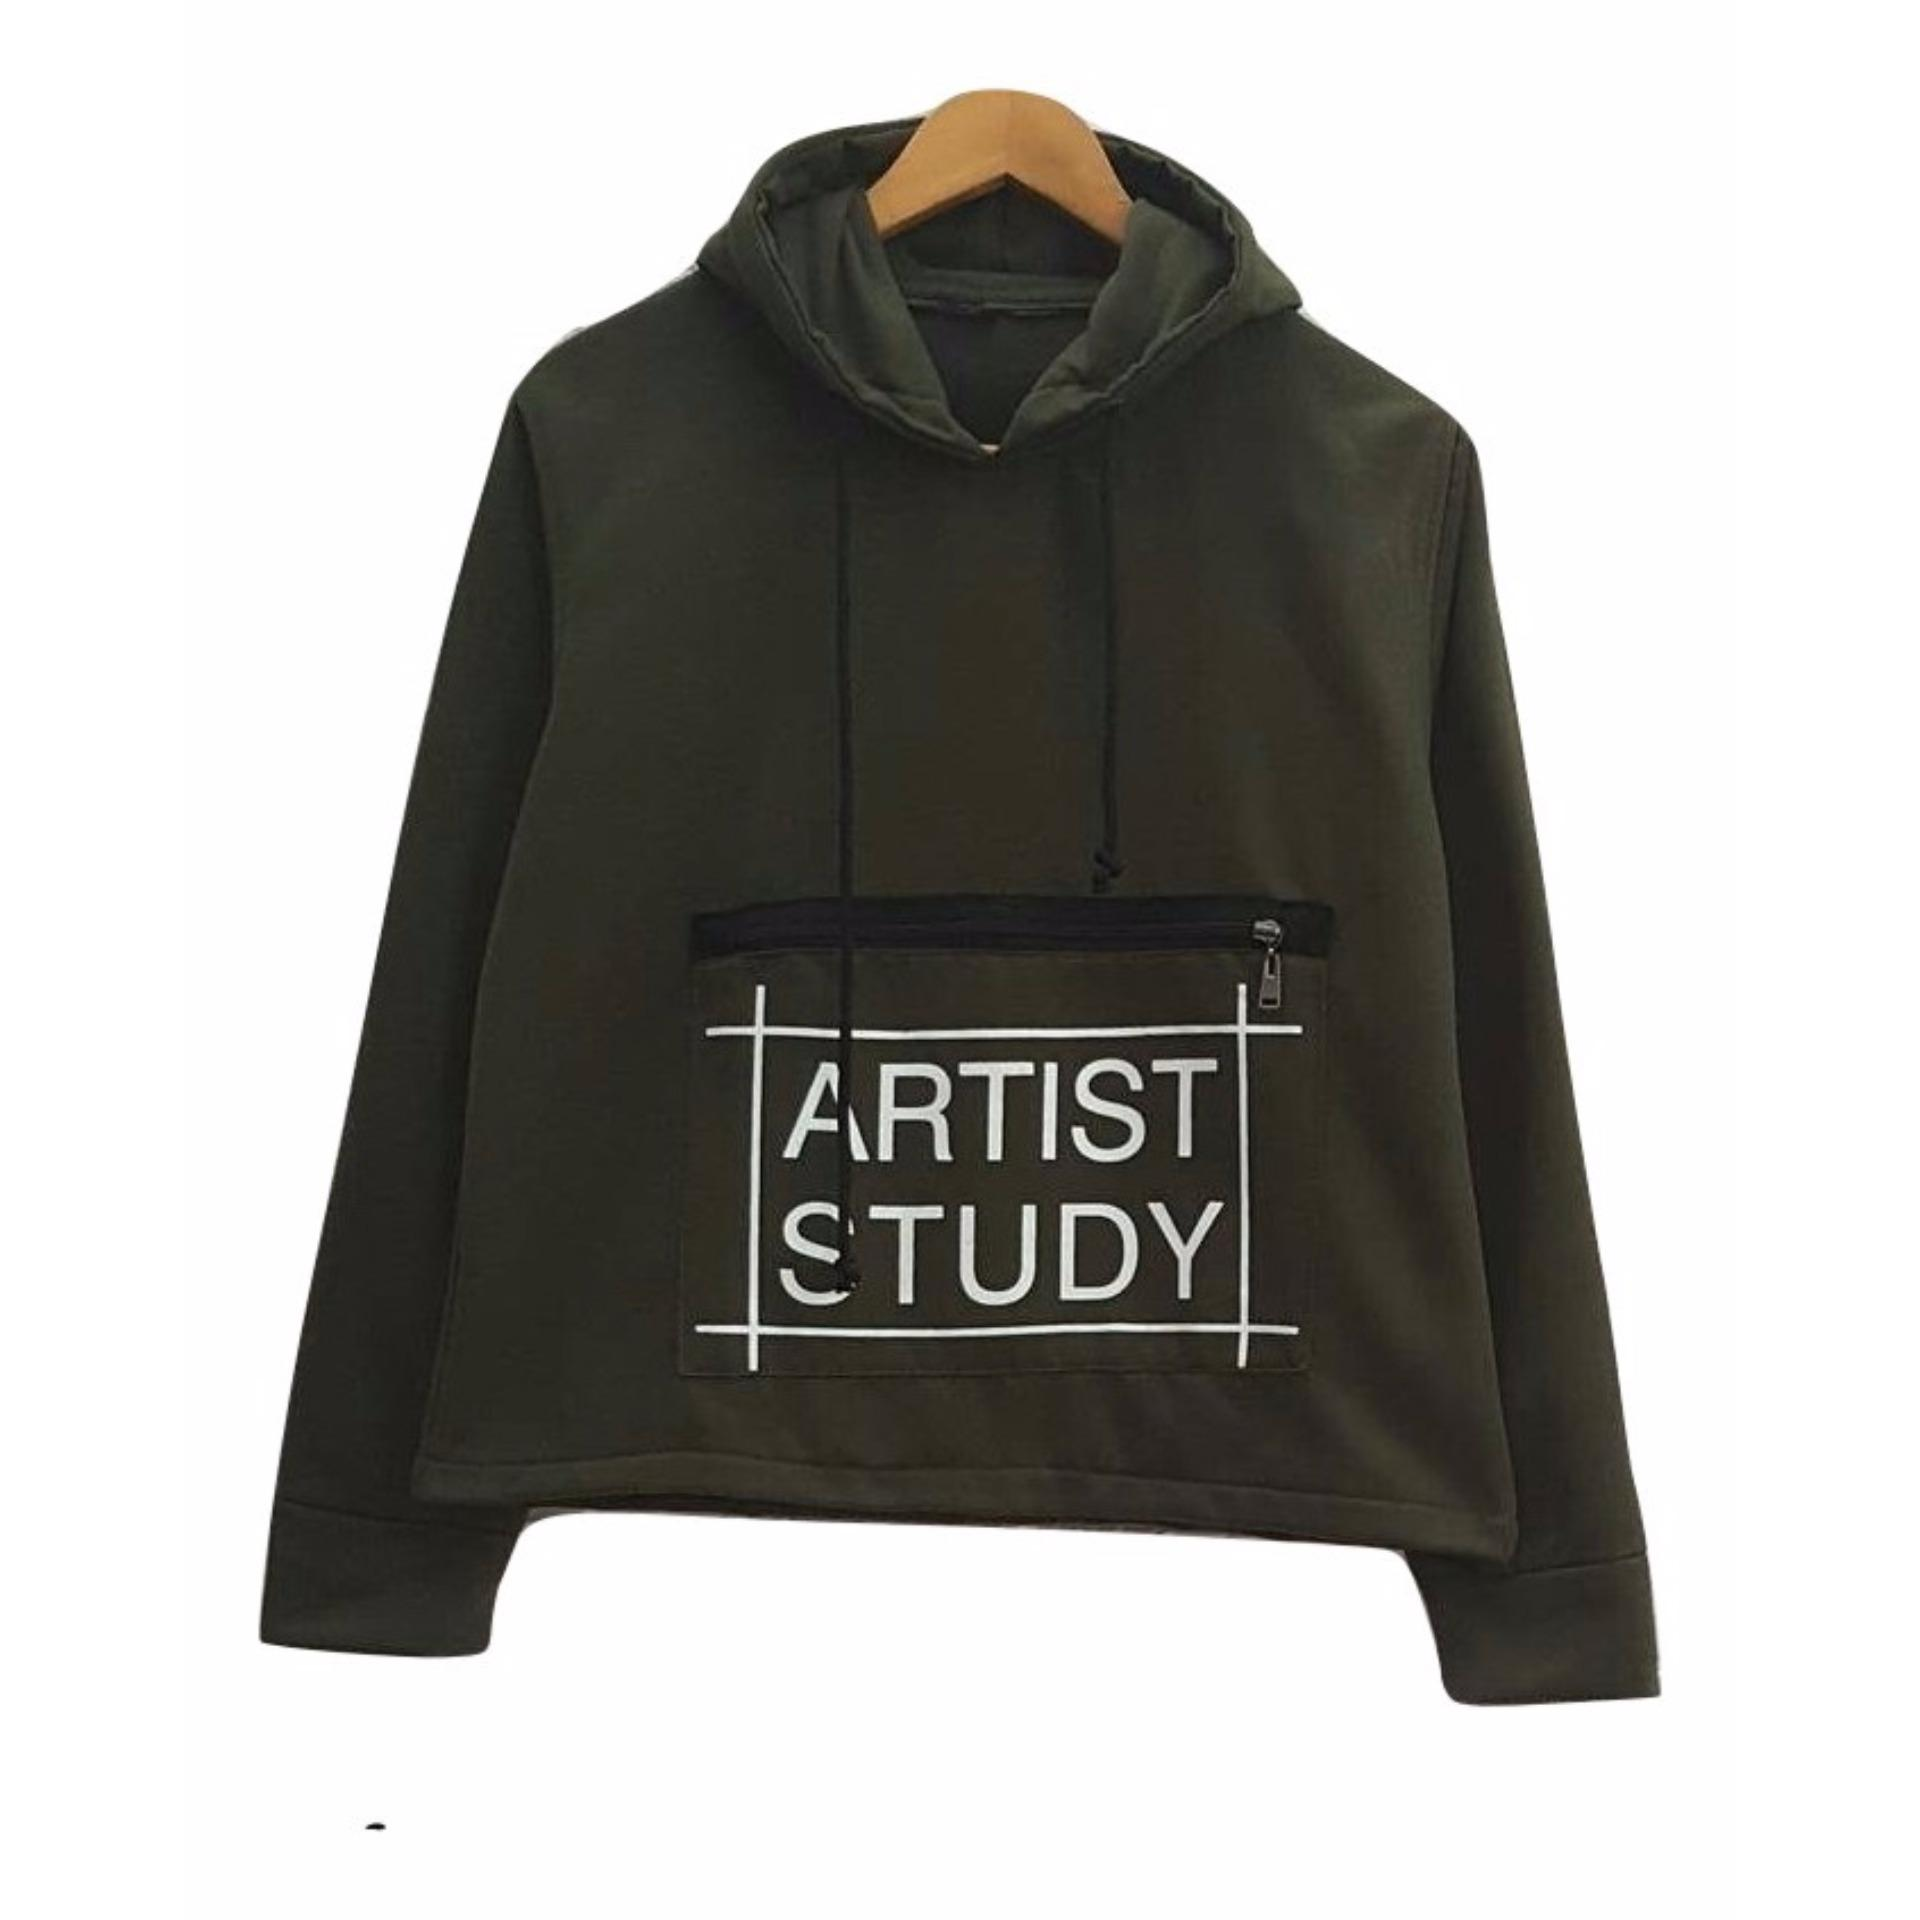 Motif Kantong Di tengah Badan 3K Artist Study Sweater - Fleece - Hijau Army